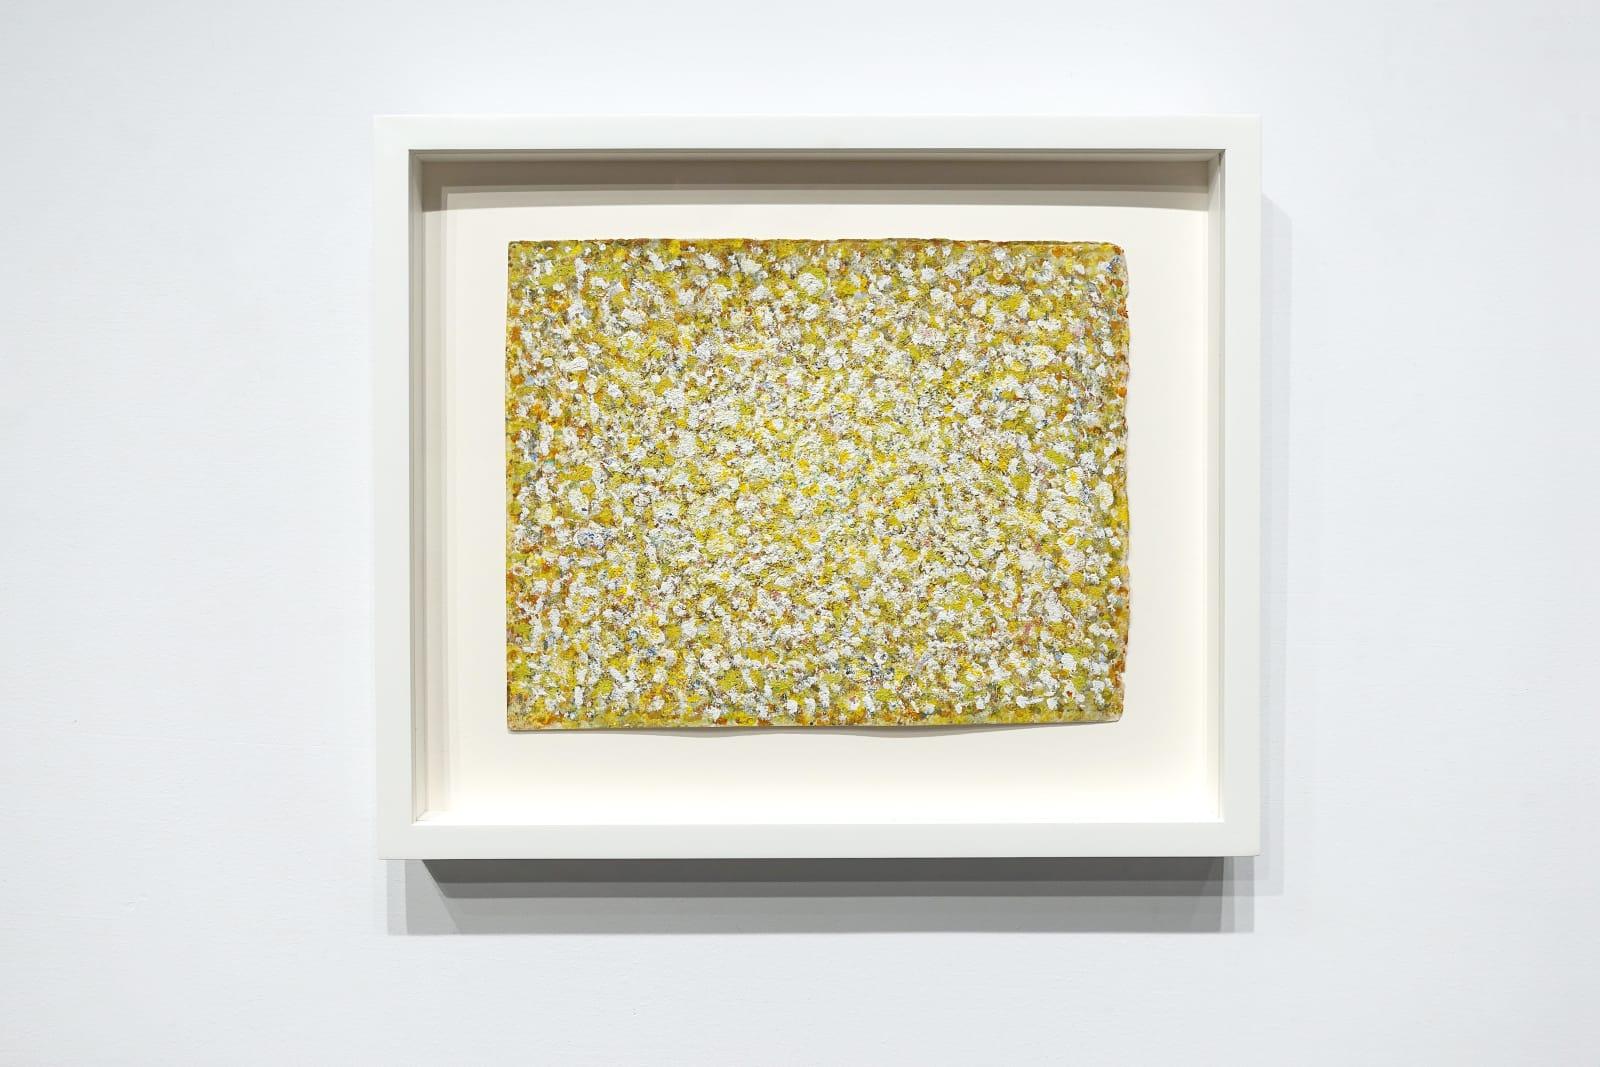 Richard Pousette-Dart, Serpentine Saffron, circa 1960s, Acrylic on paper, 9 x 11 1/4 inches